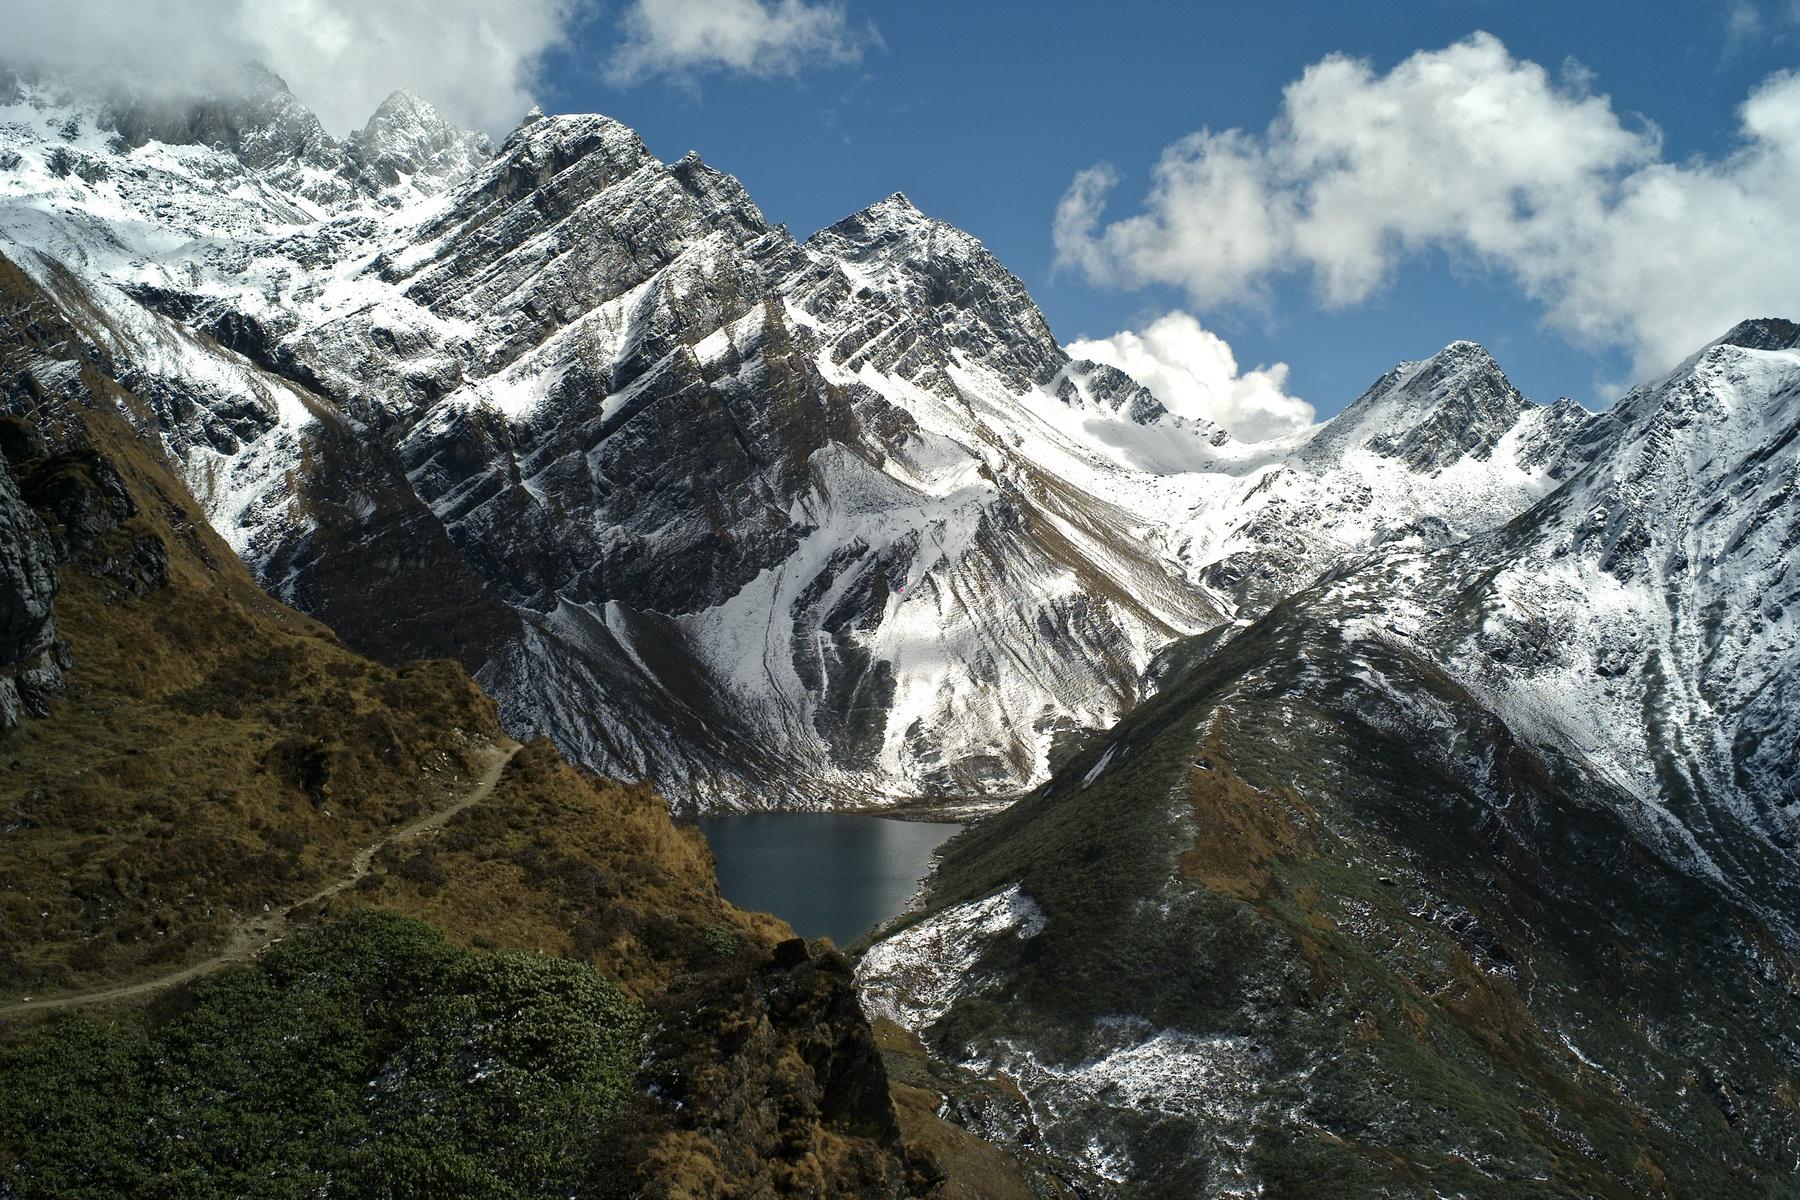 Bhutan_L9994540_∏ Luca Bracali